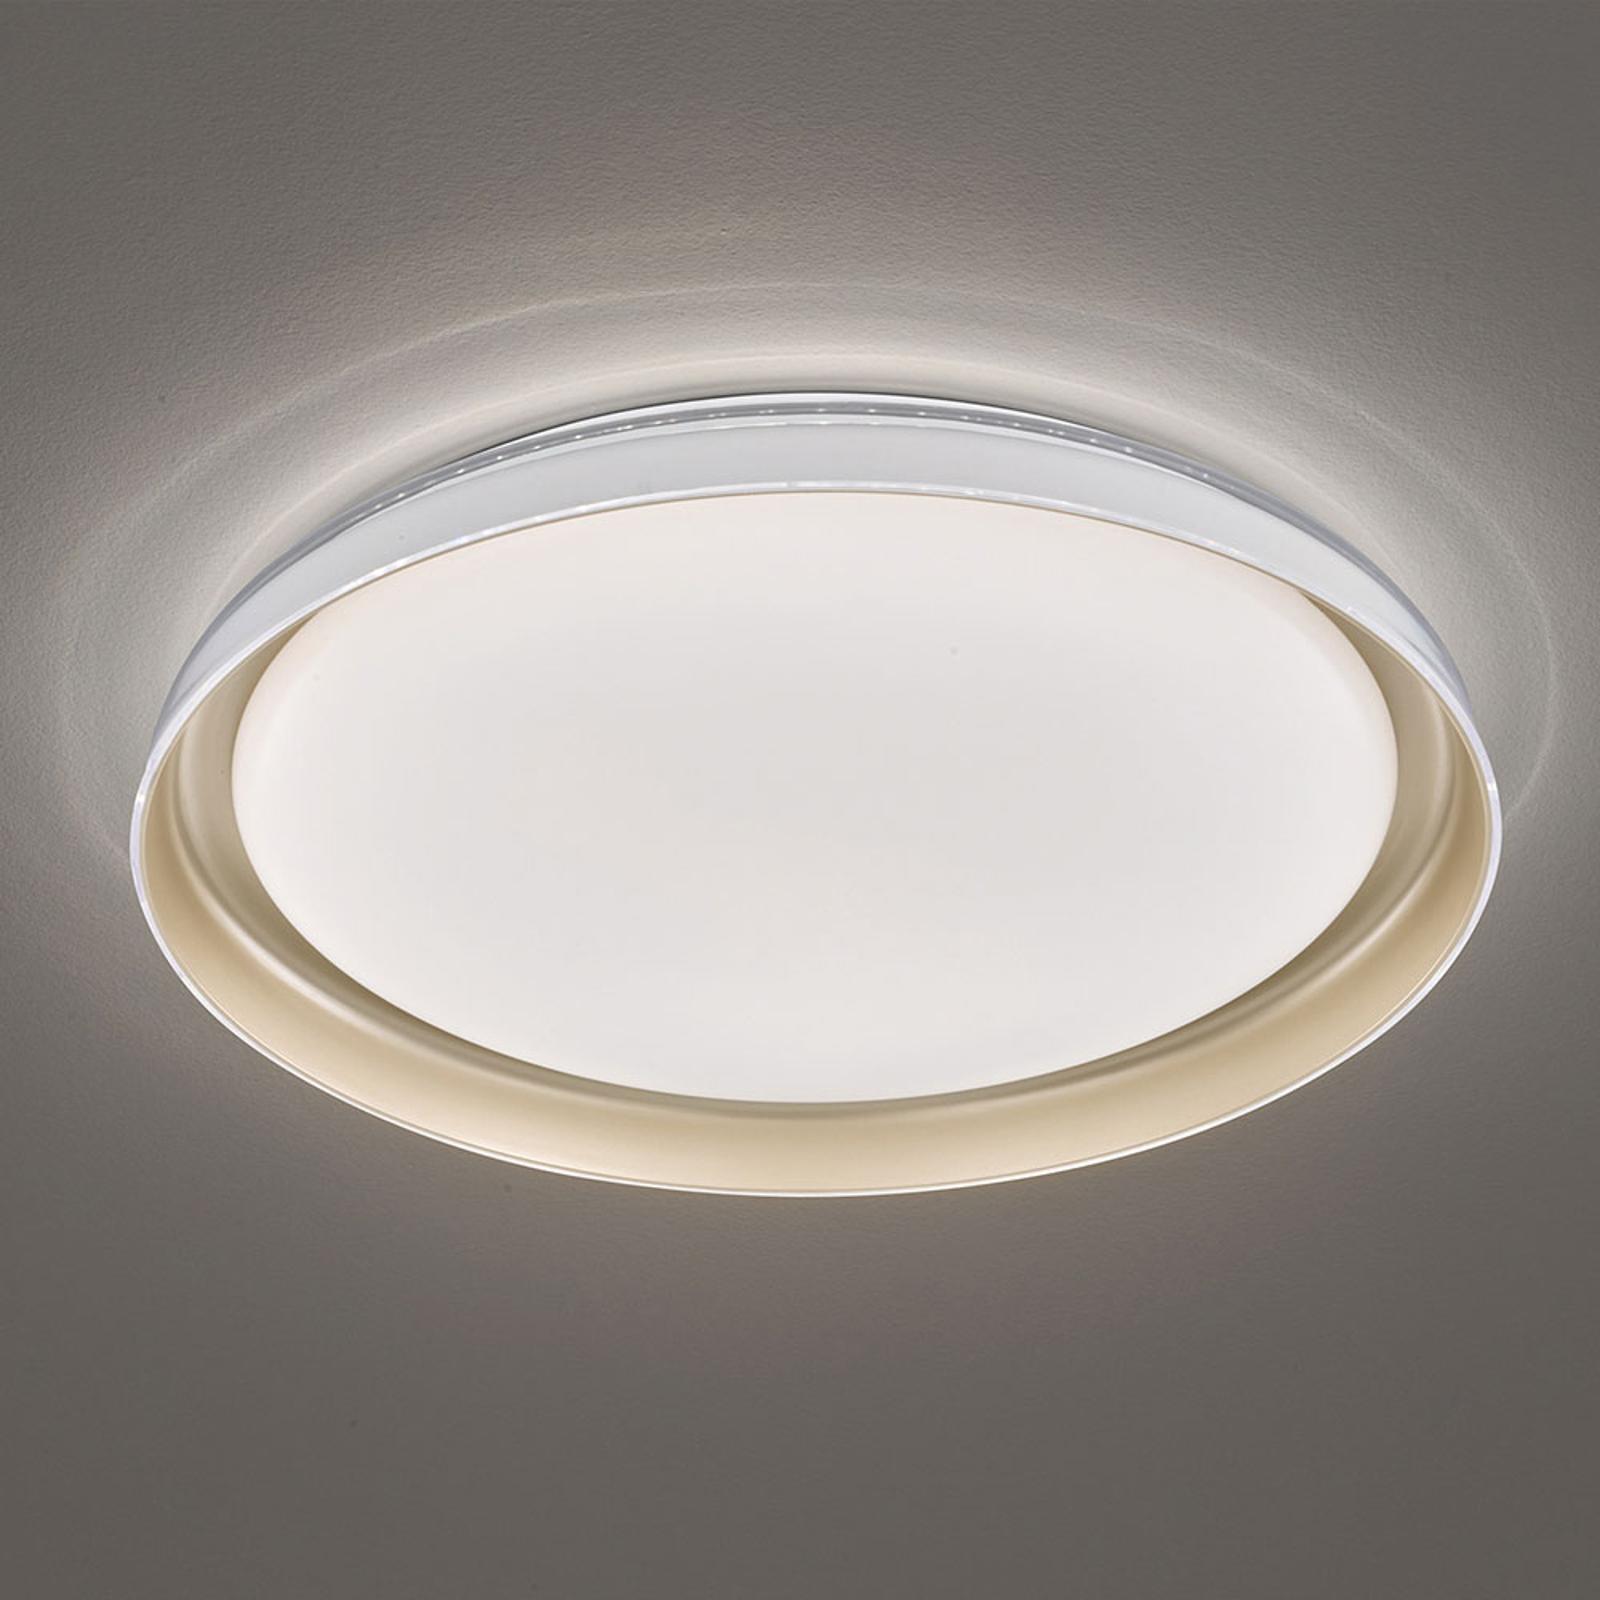 LED-taklampe Rilla, dimbar, Ø 43 cm